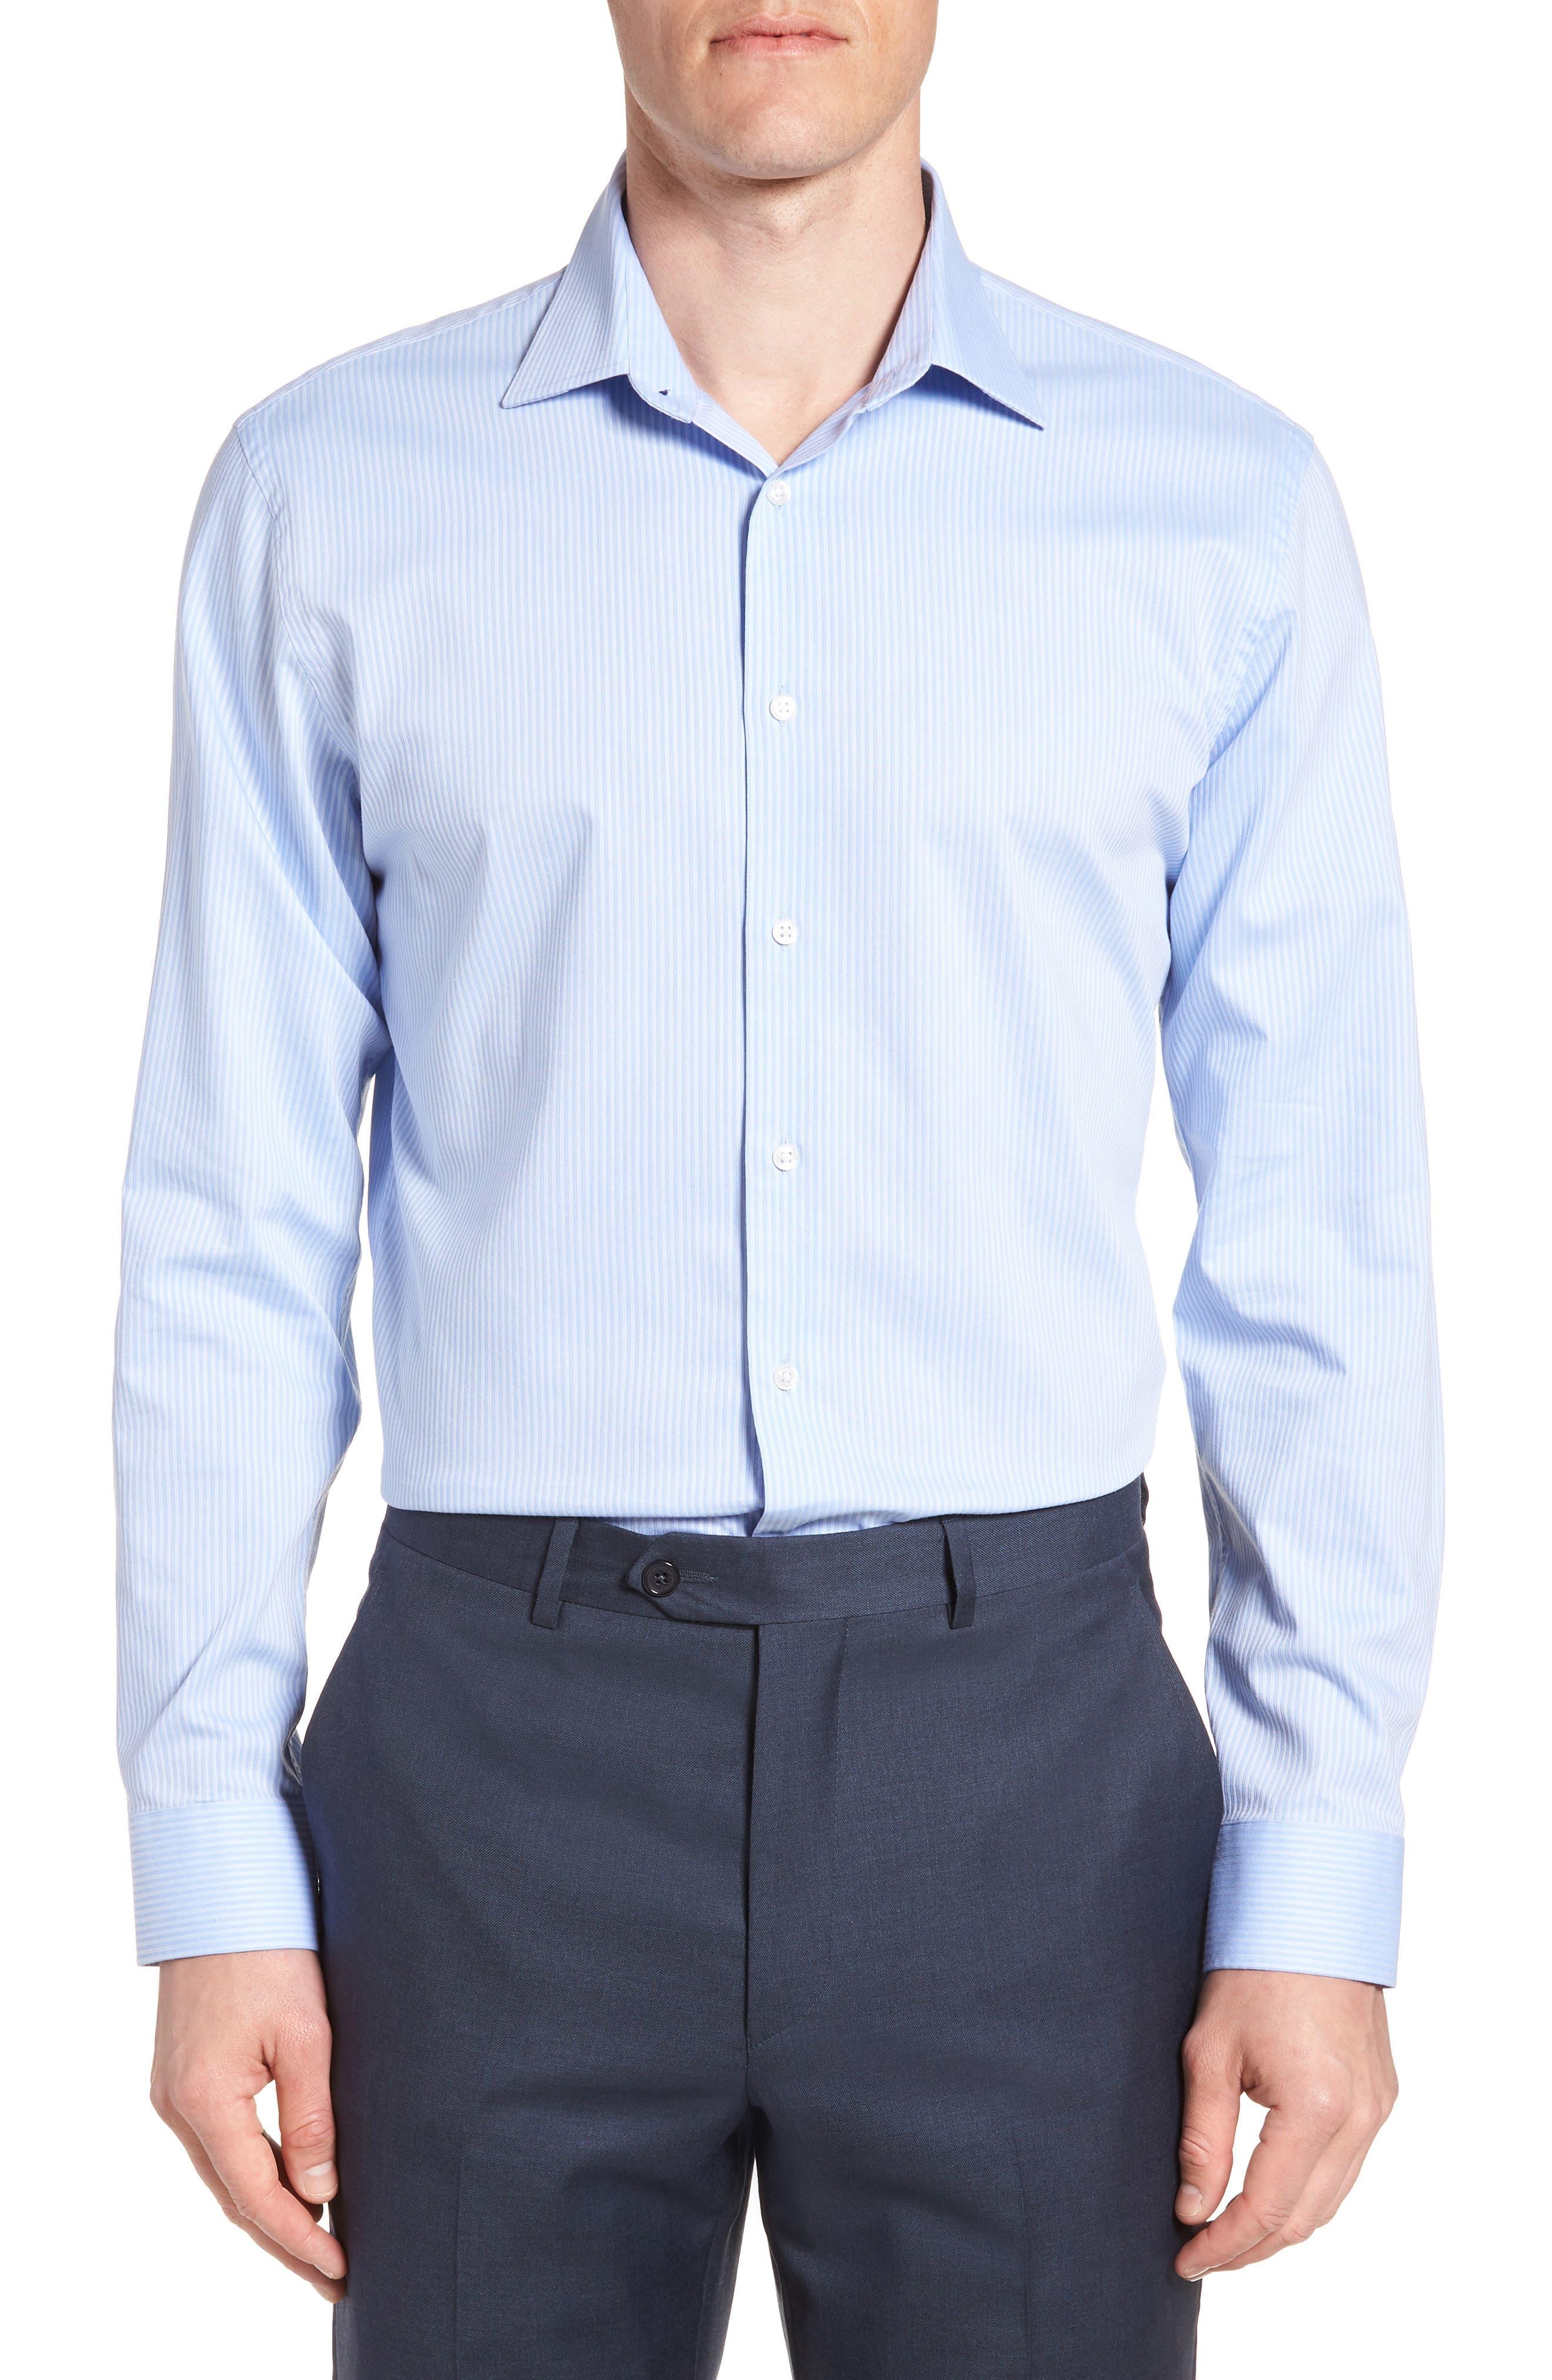 Tech-Smart Trim Fit Stretch Stripe Dress Shirt,                             Main thumbnail 1, color,                             450